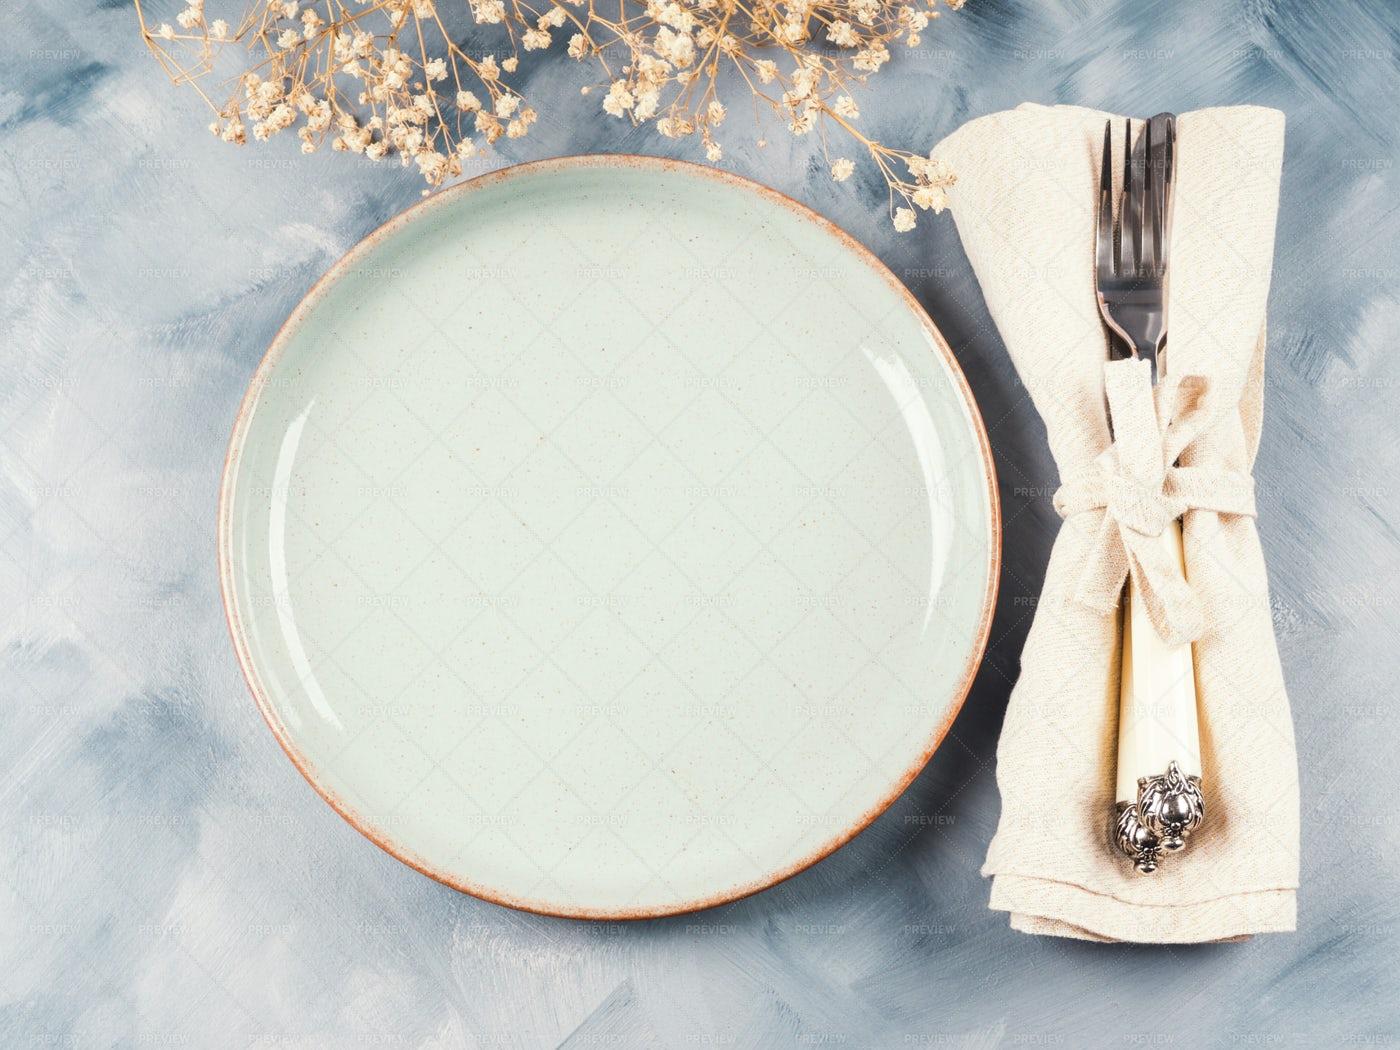 Blue Dish And Silverware: Stock Photos